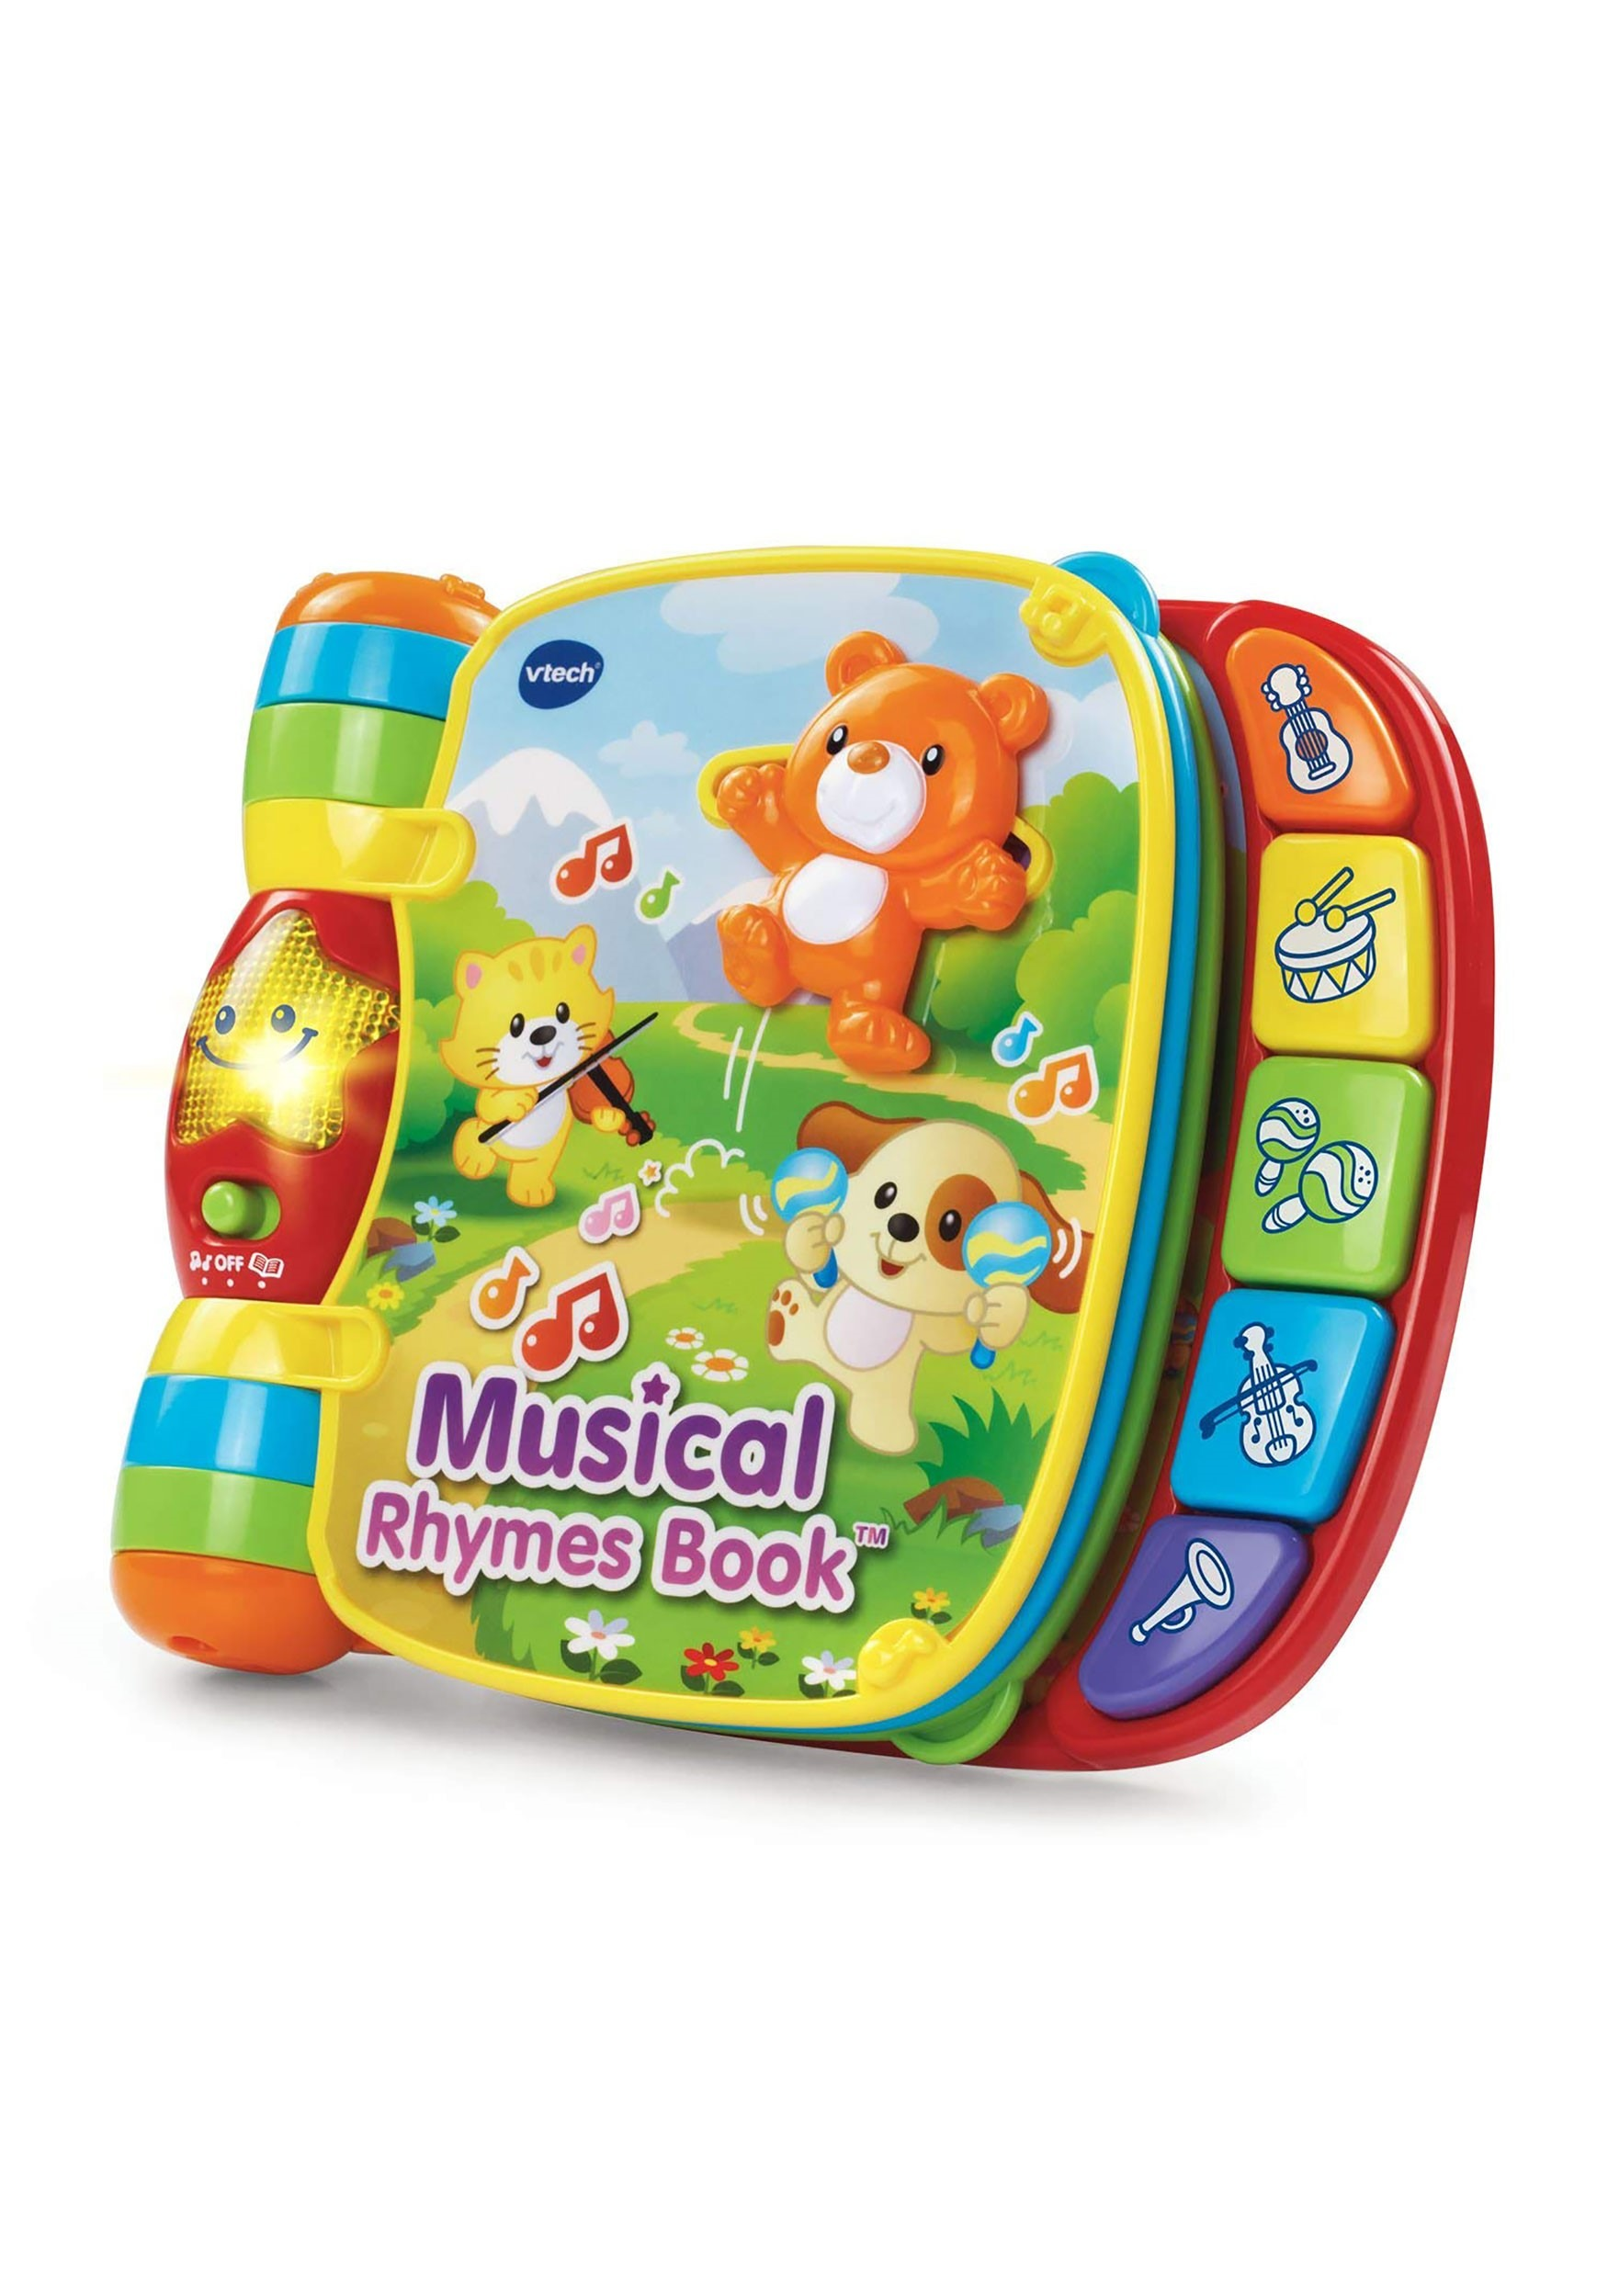 Babies VTech Musical Rhymes Book